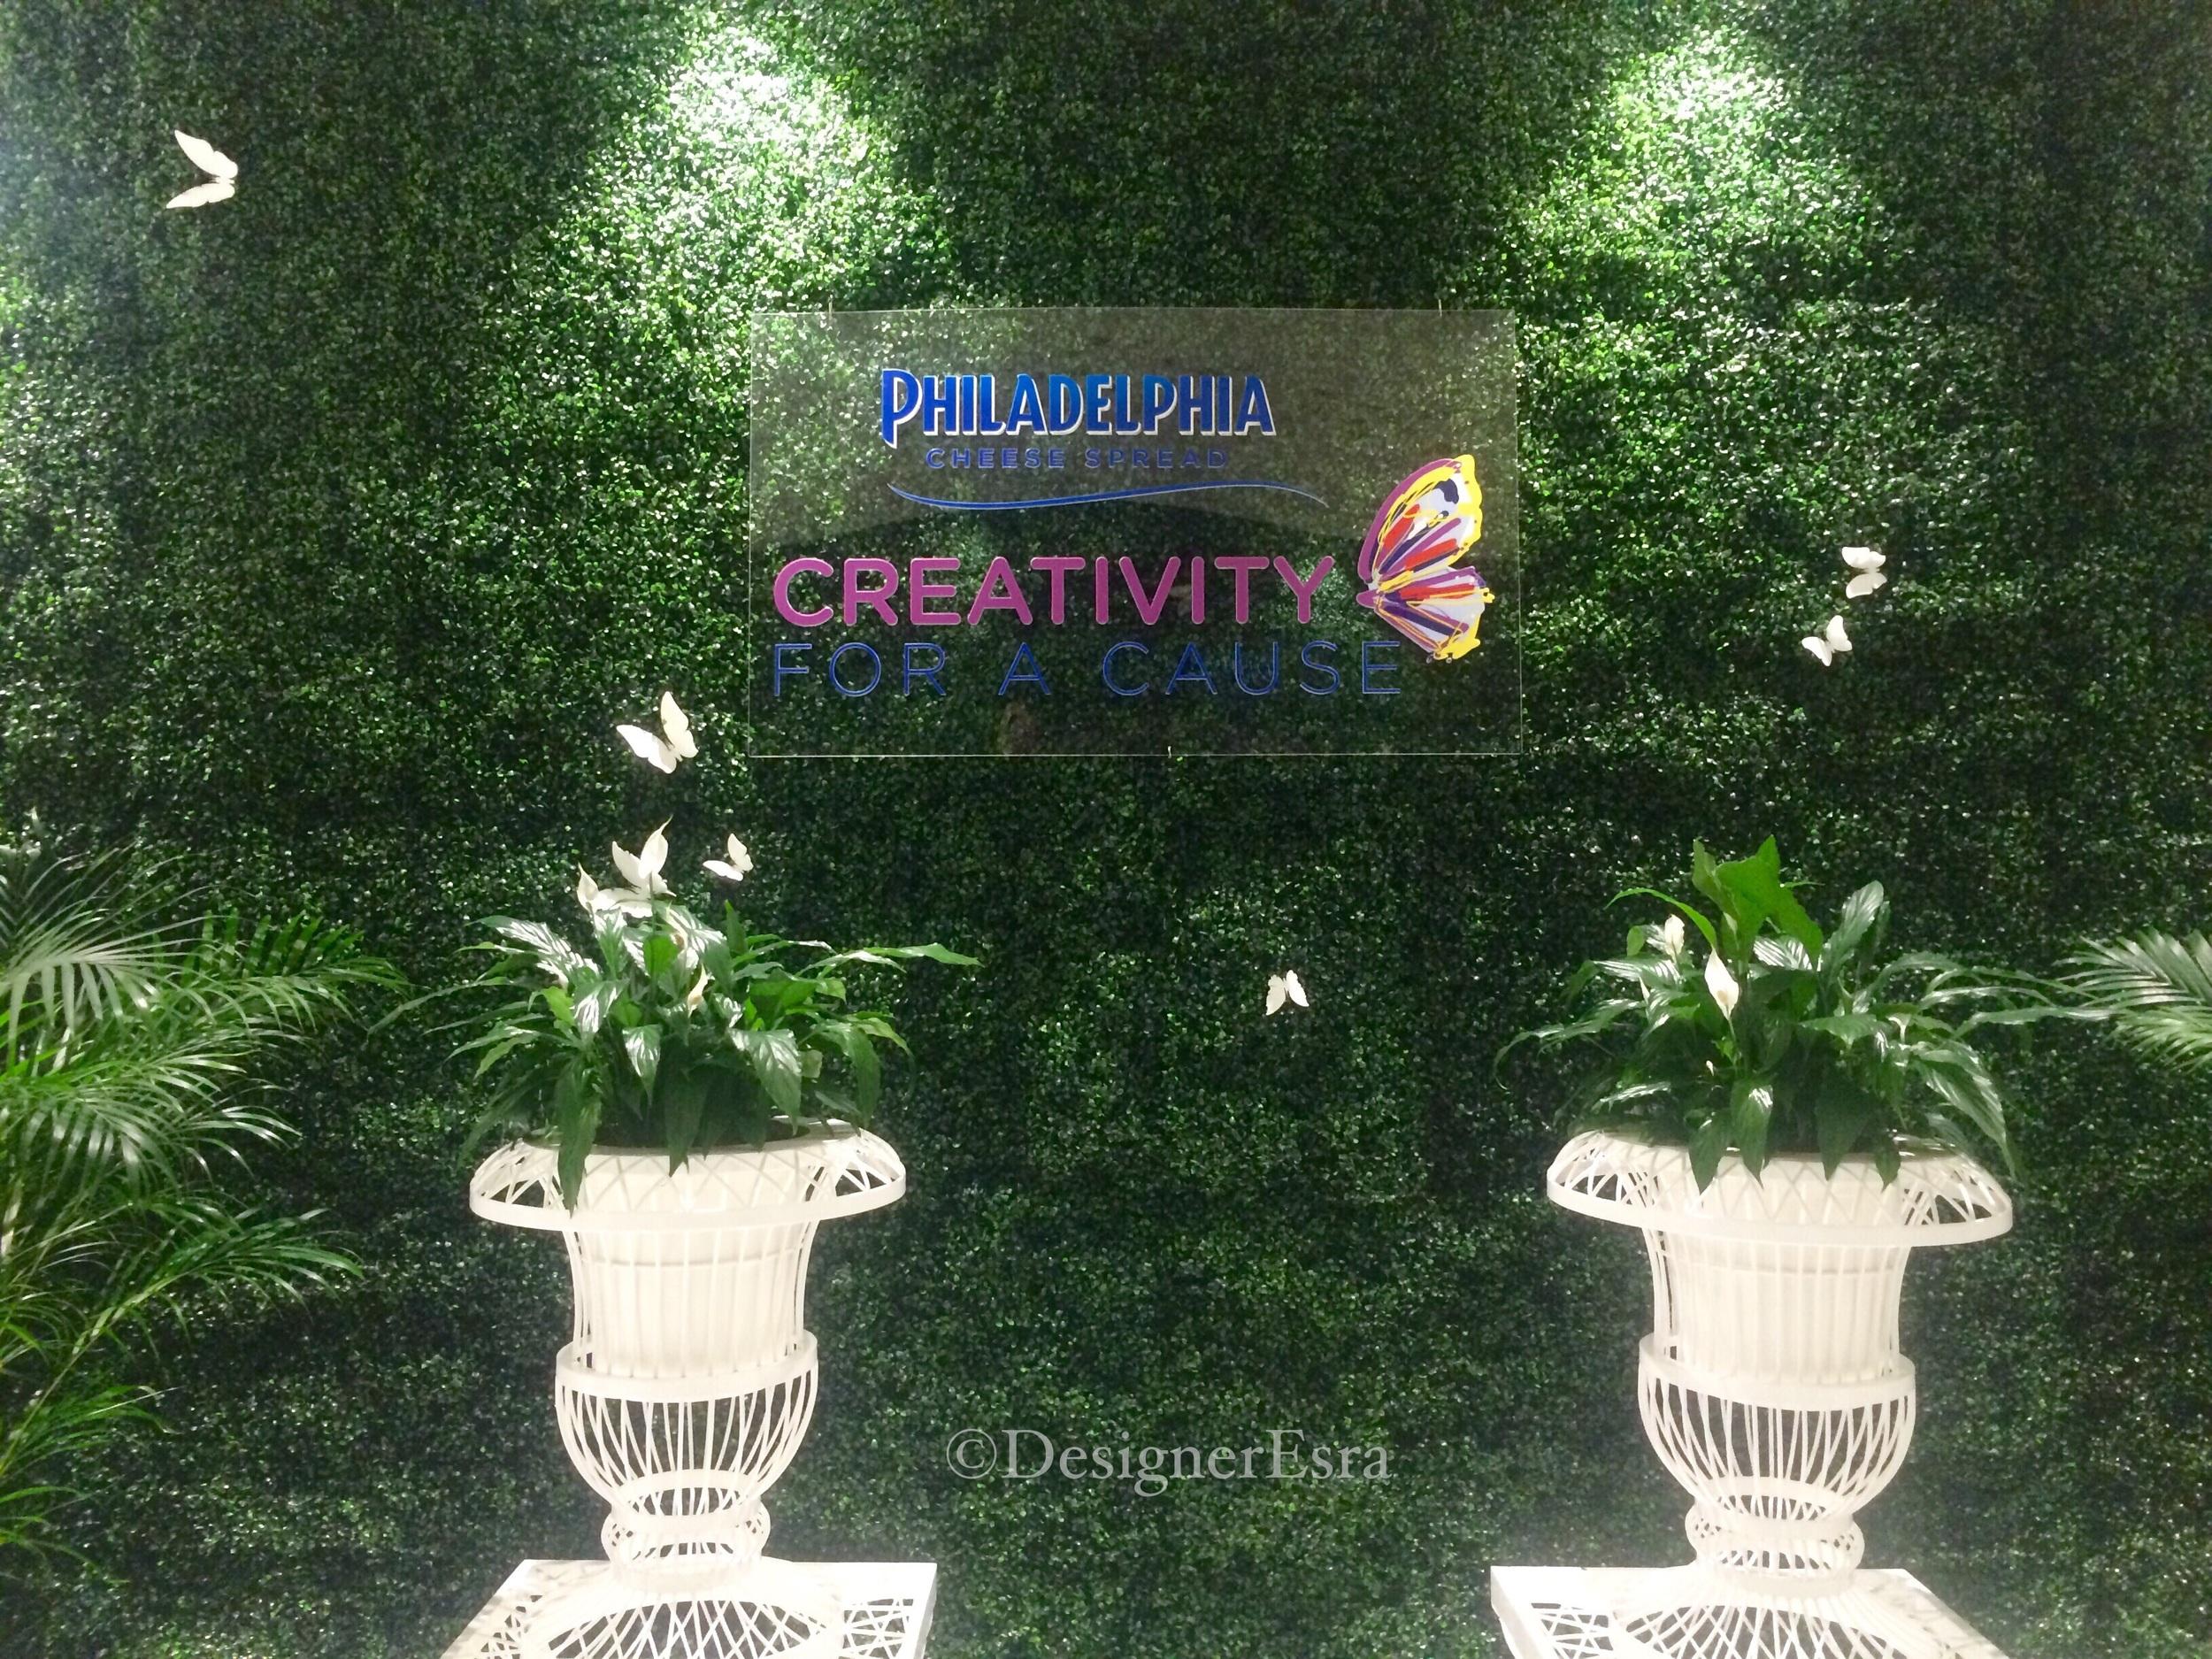 Creativity For a Cause Philadelphia Arabia